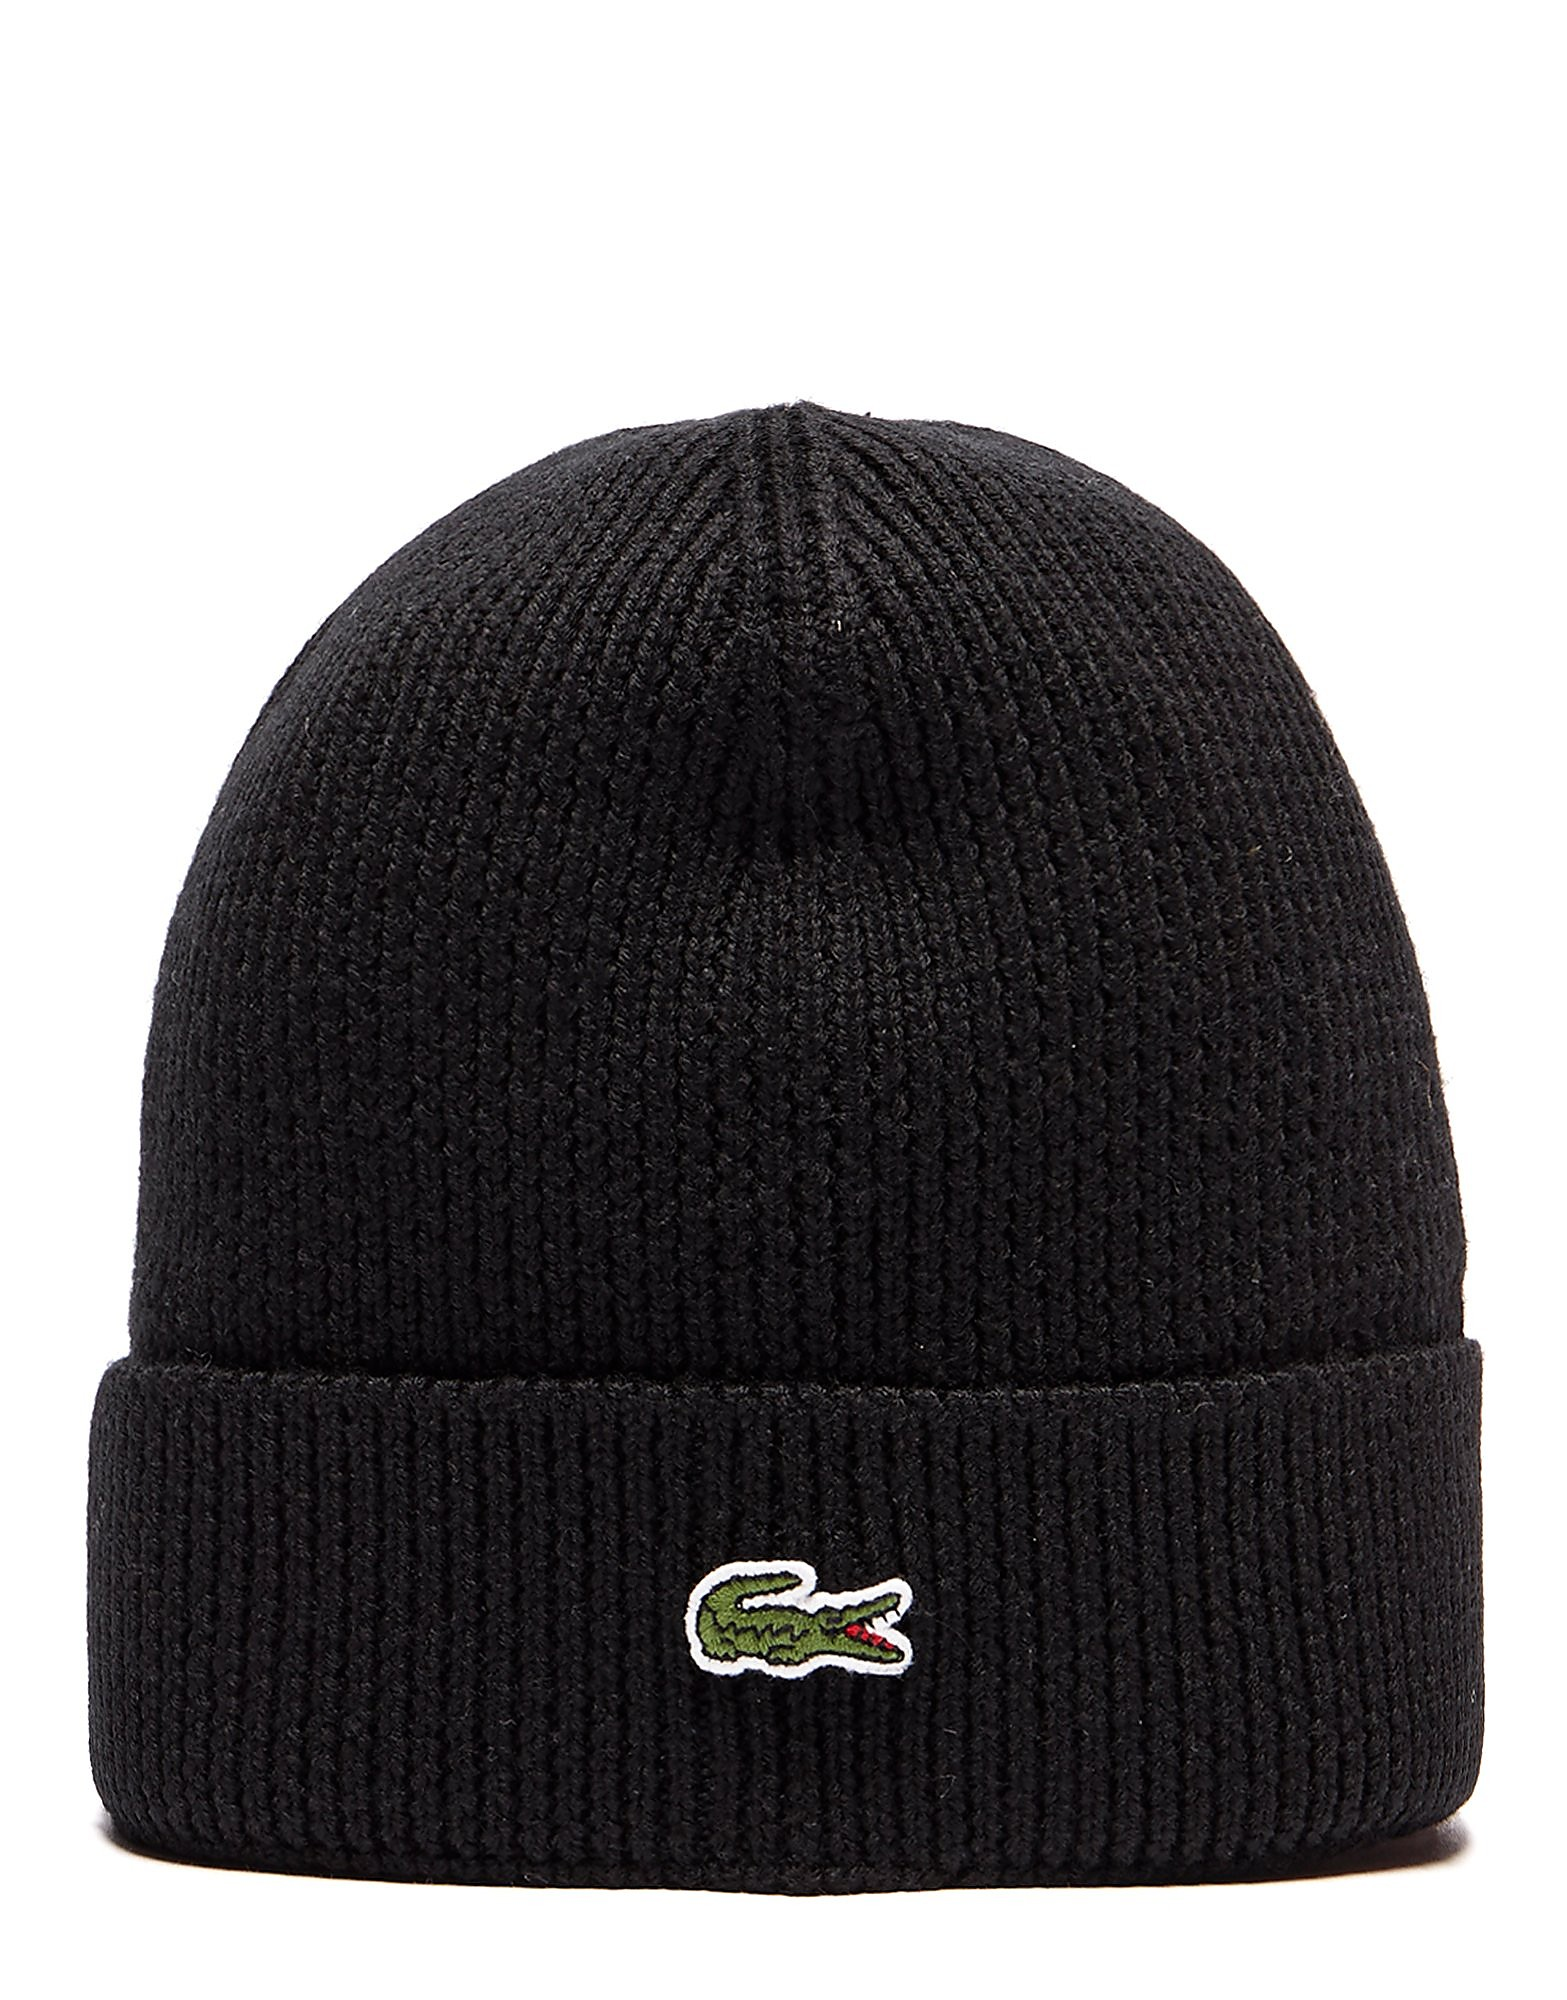 Lacoste Cuffed Beanie Hat